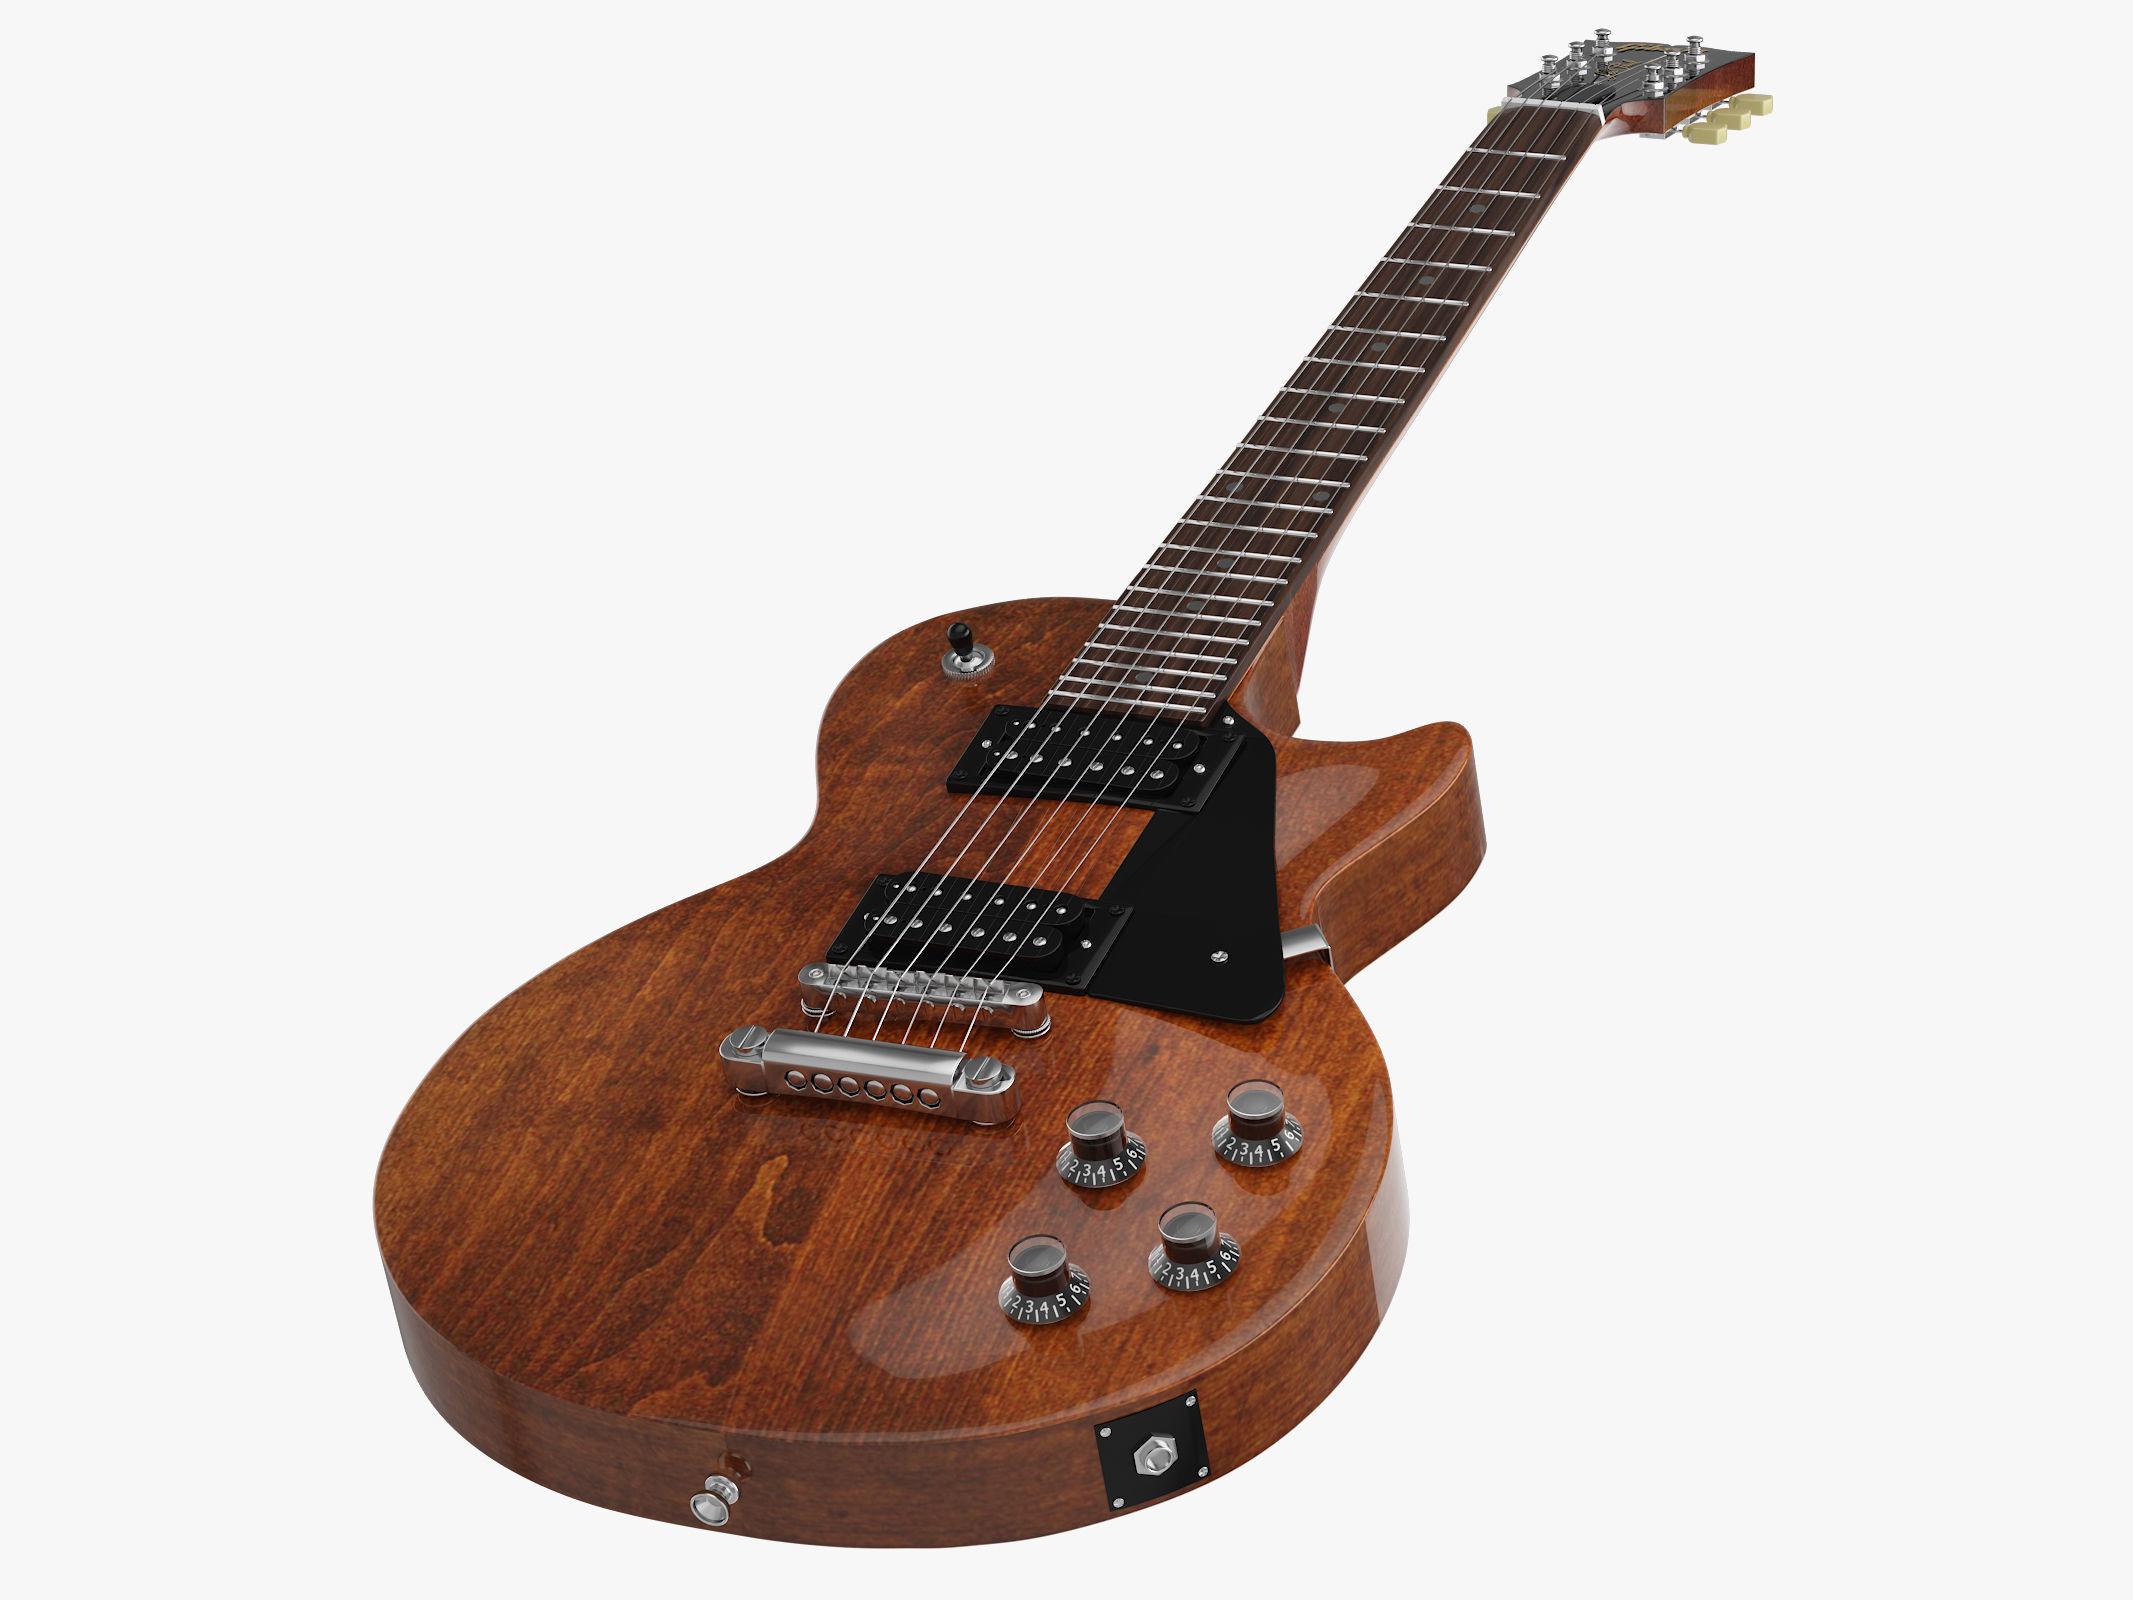 Gibson Les Paul Faded 2018 Worn Bourbon Electric Guitar | 3D model